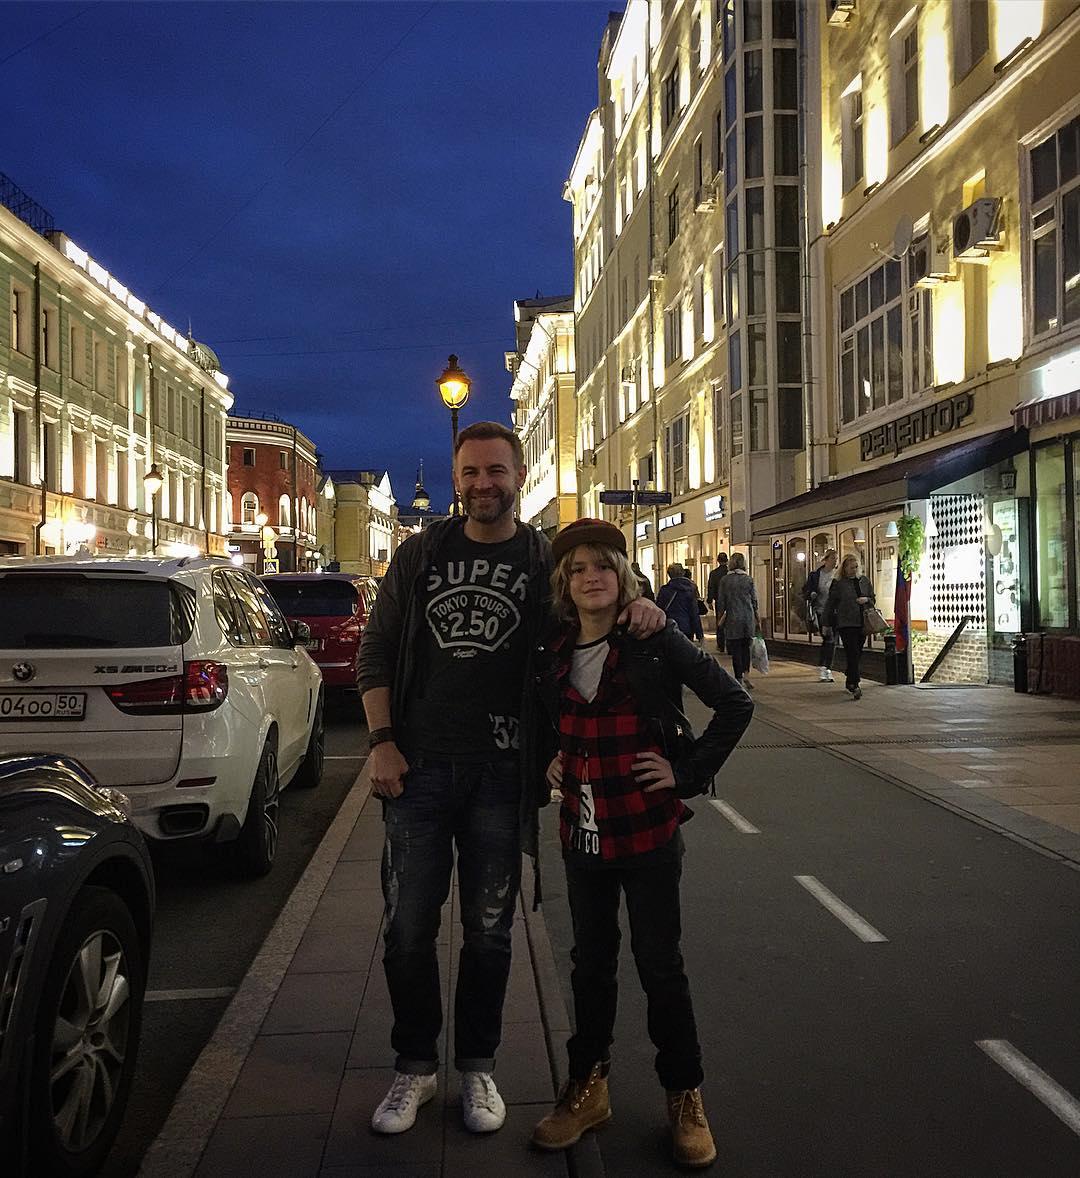 Ирина Дубцова тайно вышла замуж